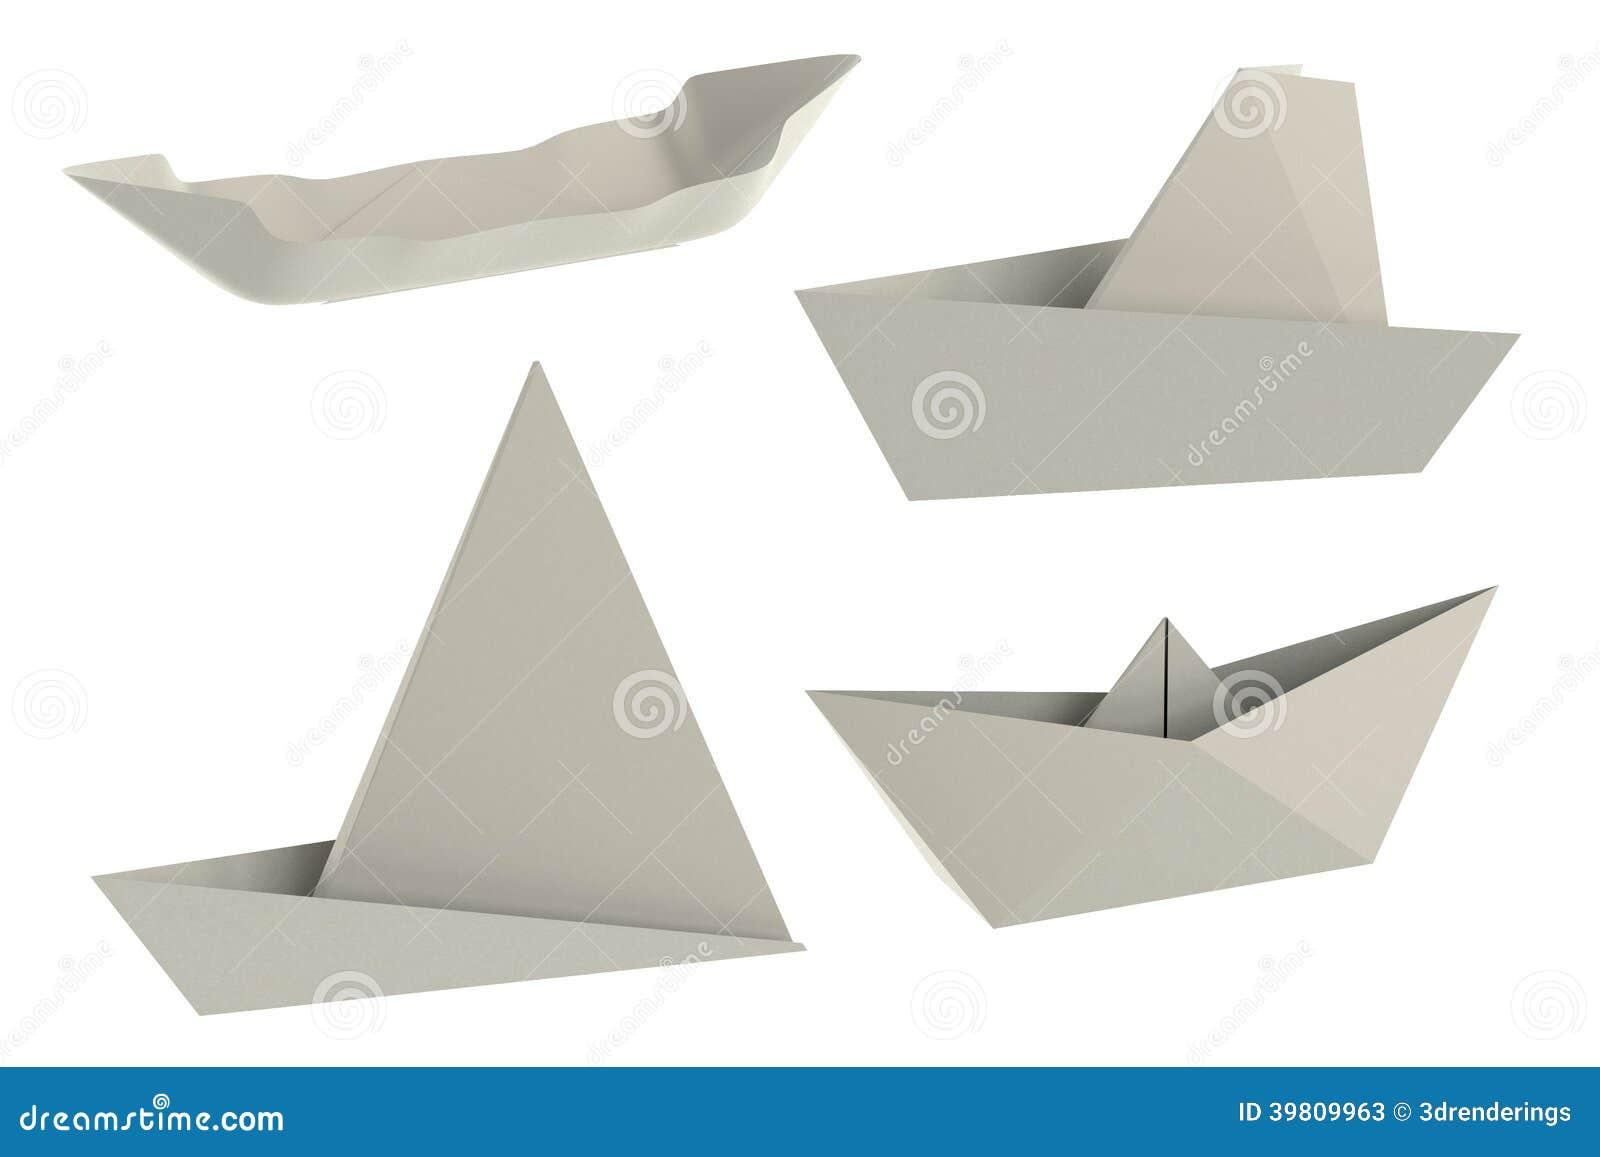 3d render of origami ships stock illustration image